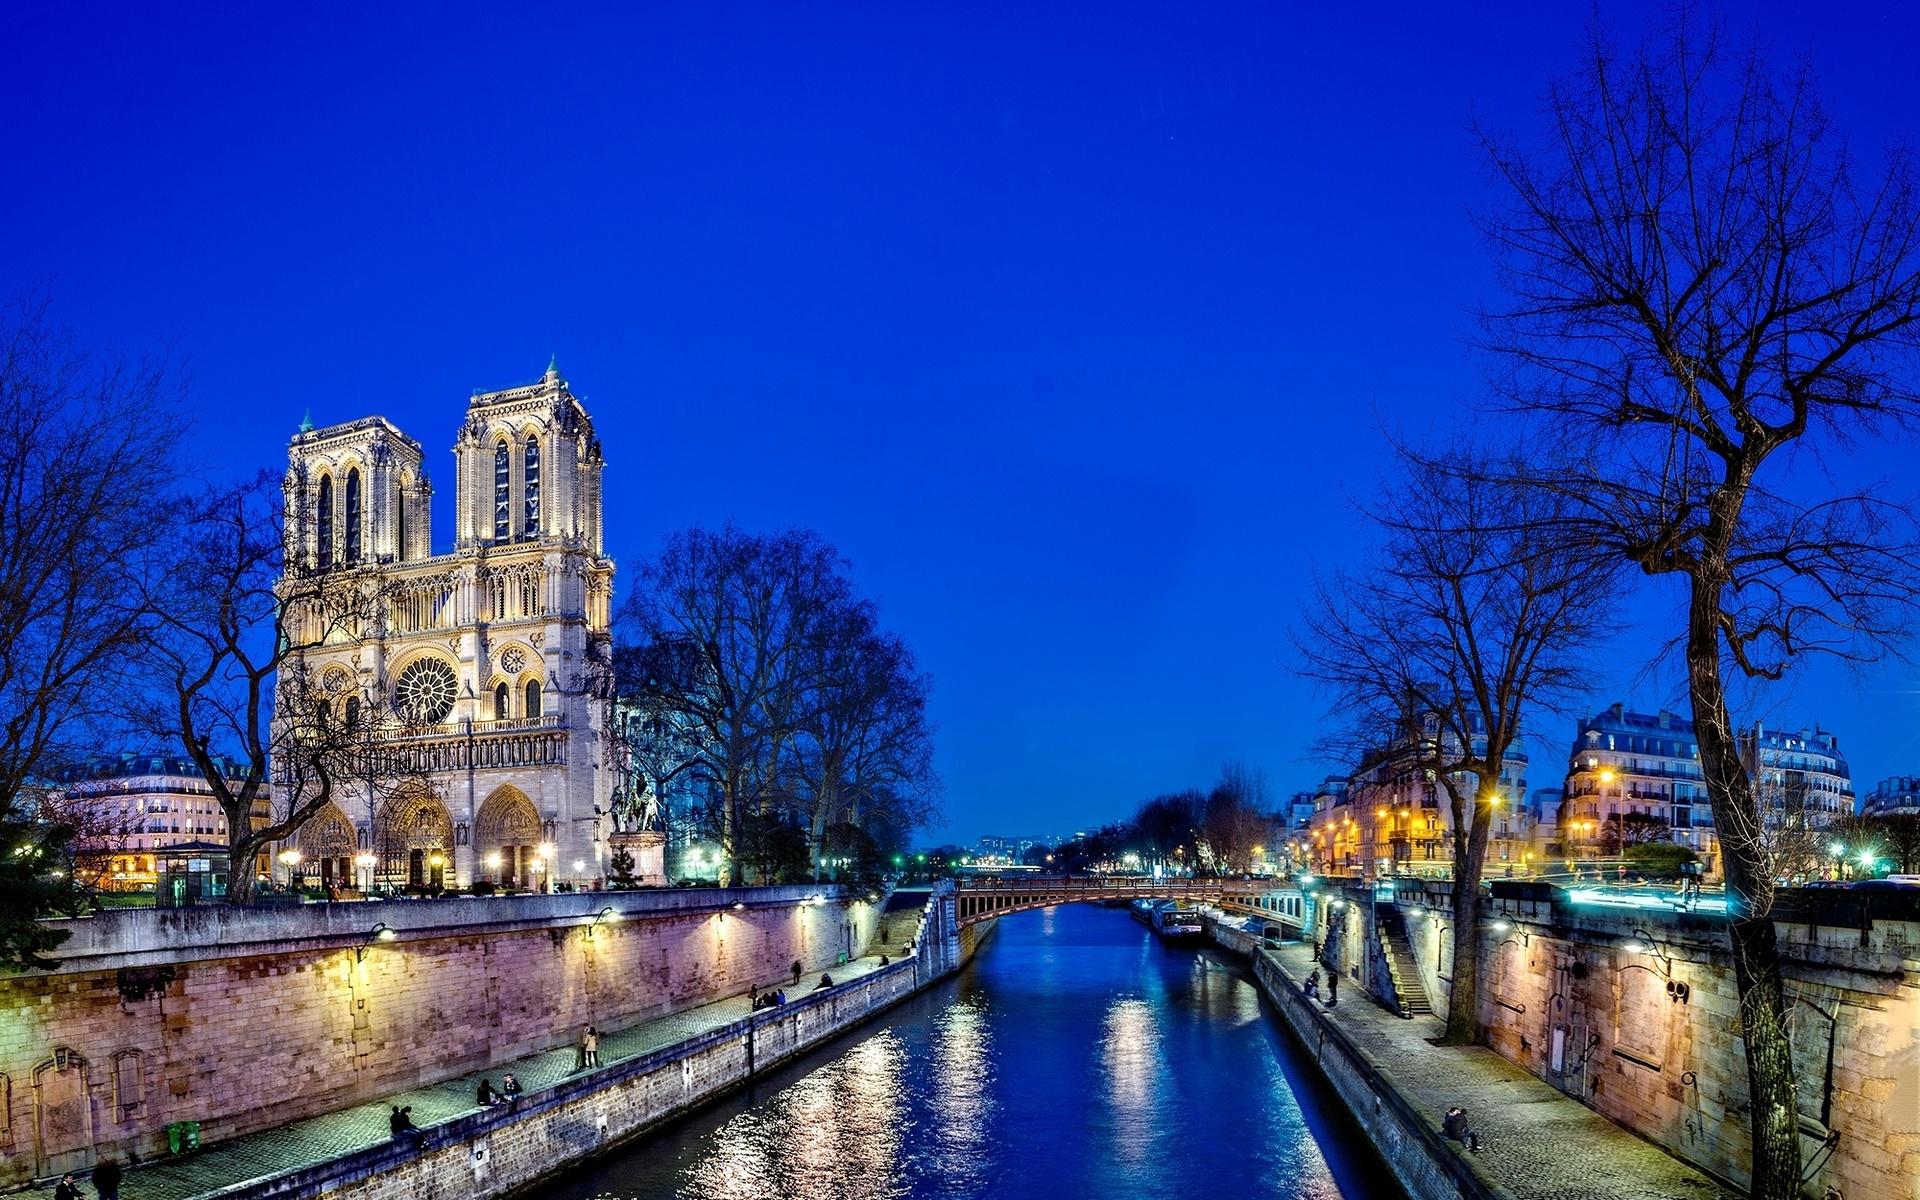 Notre Dame HD Wallpaper